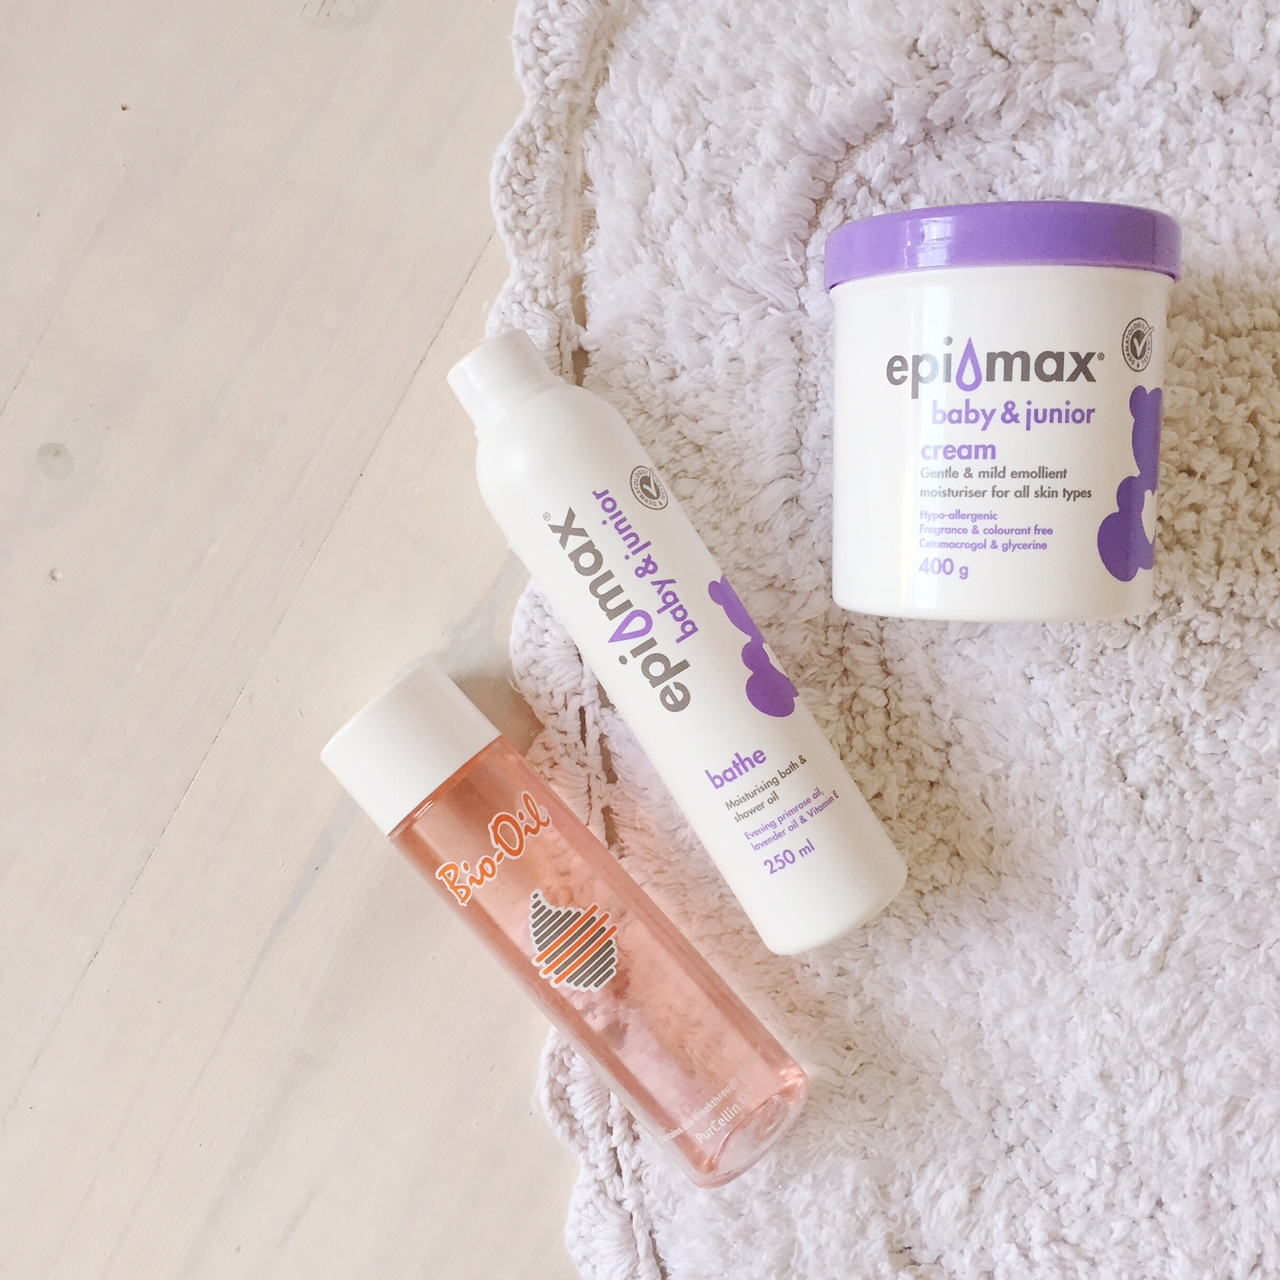 Bath & Shower Essentials - Bio-Oil, Epimax bath oil & Epimax cream